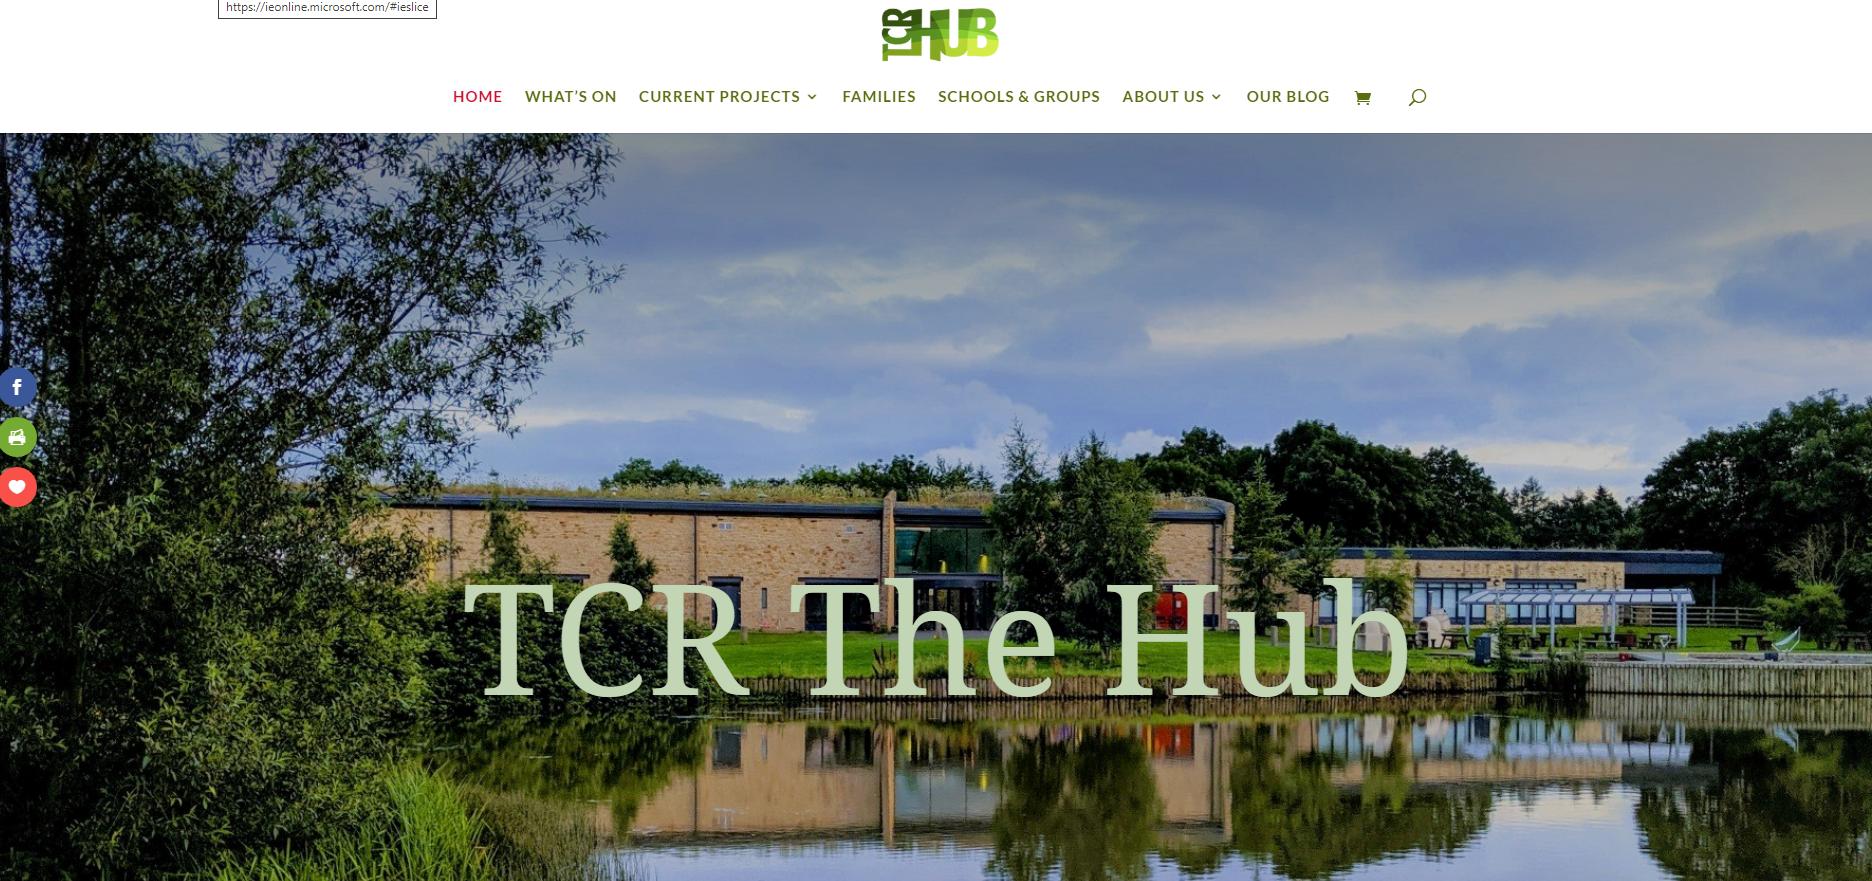 TCR Hub website Barnard Castle community venue